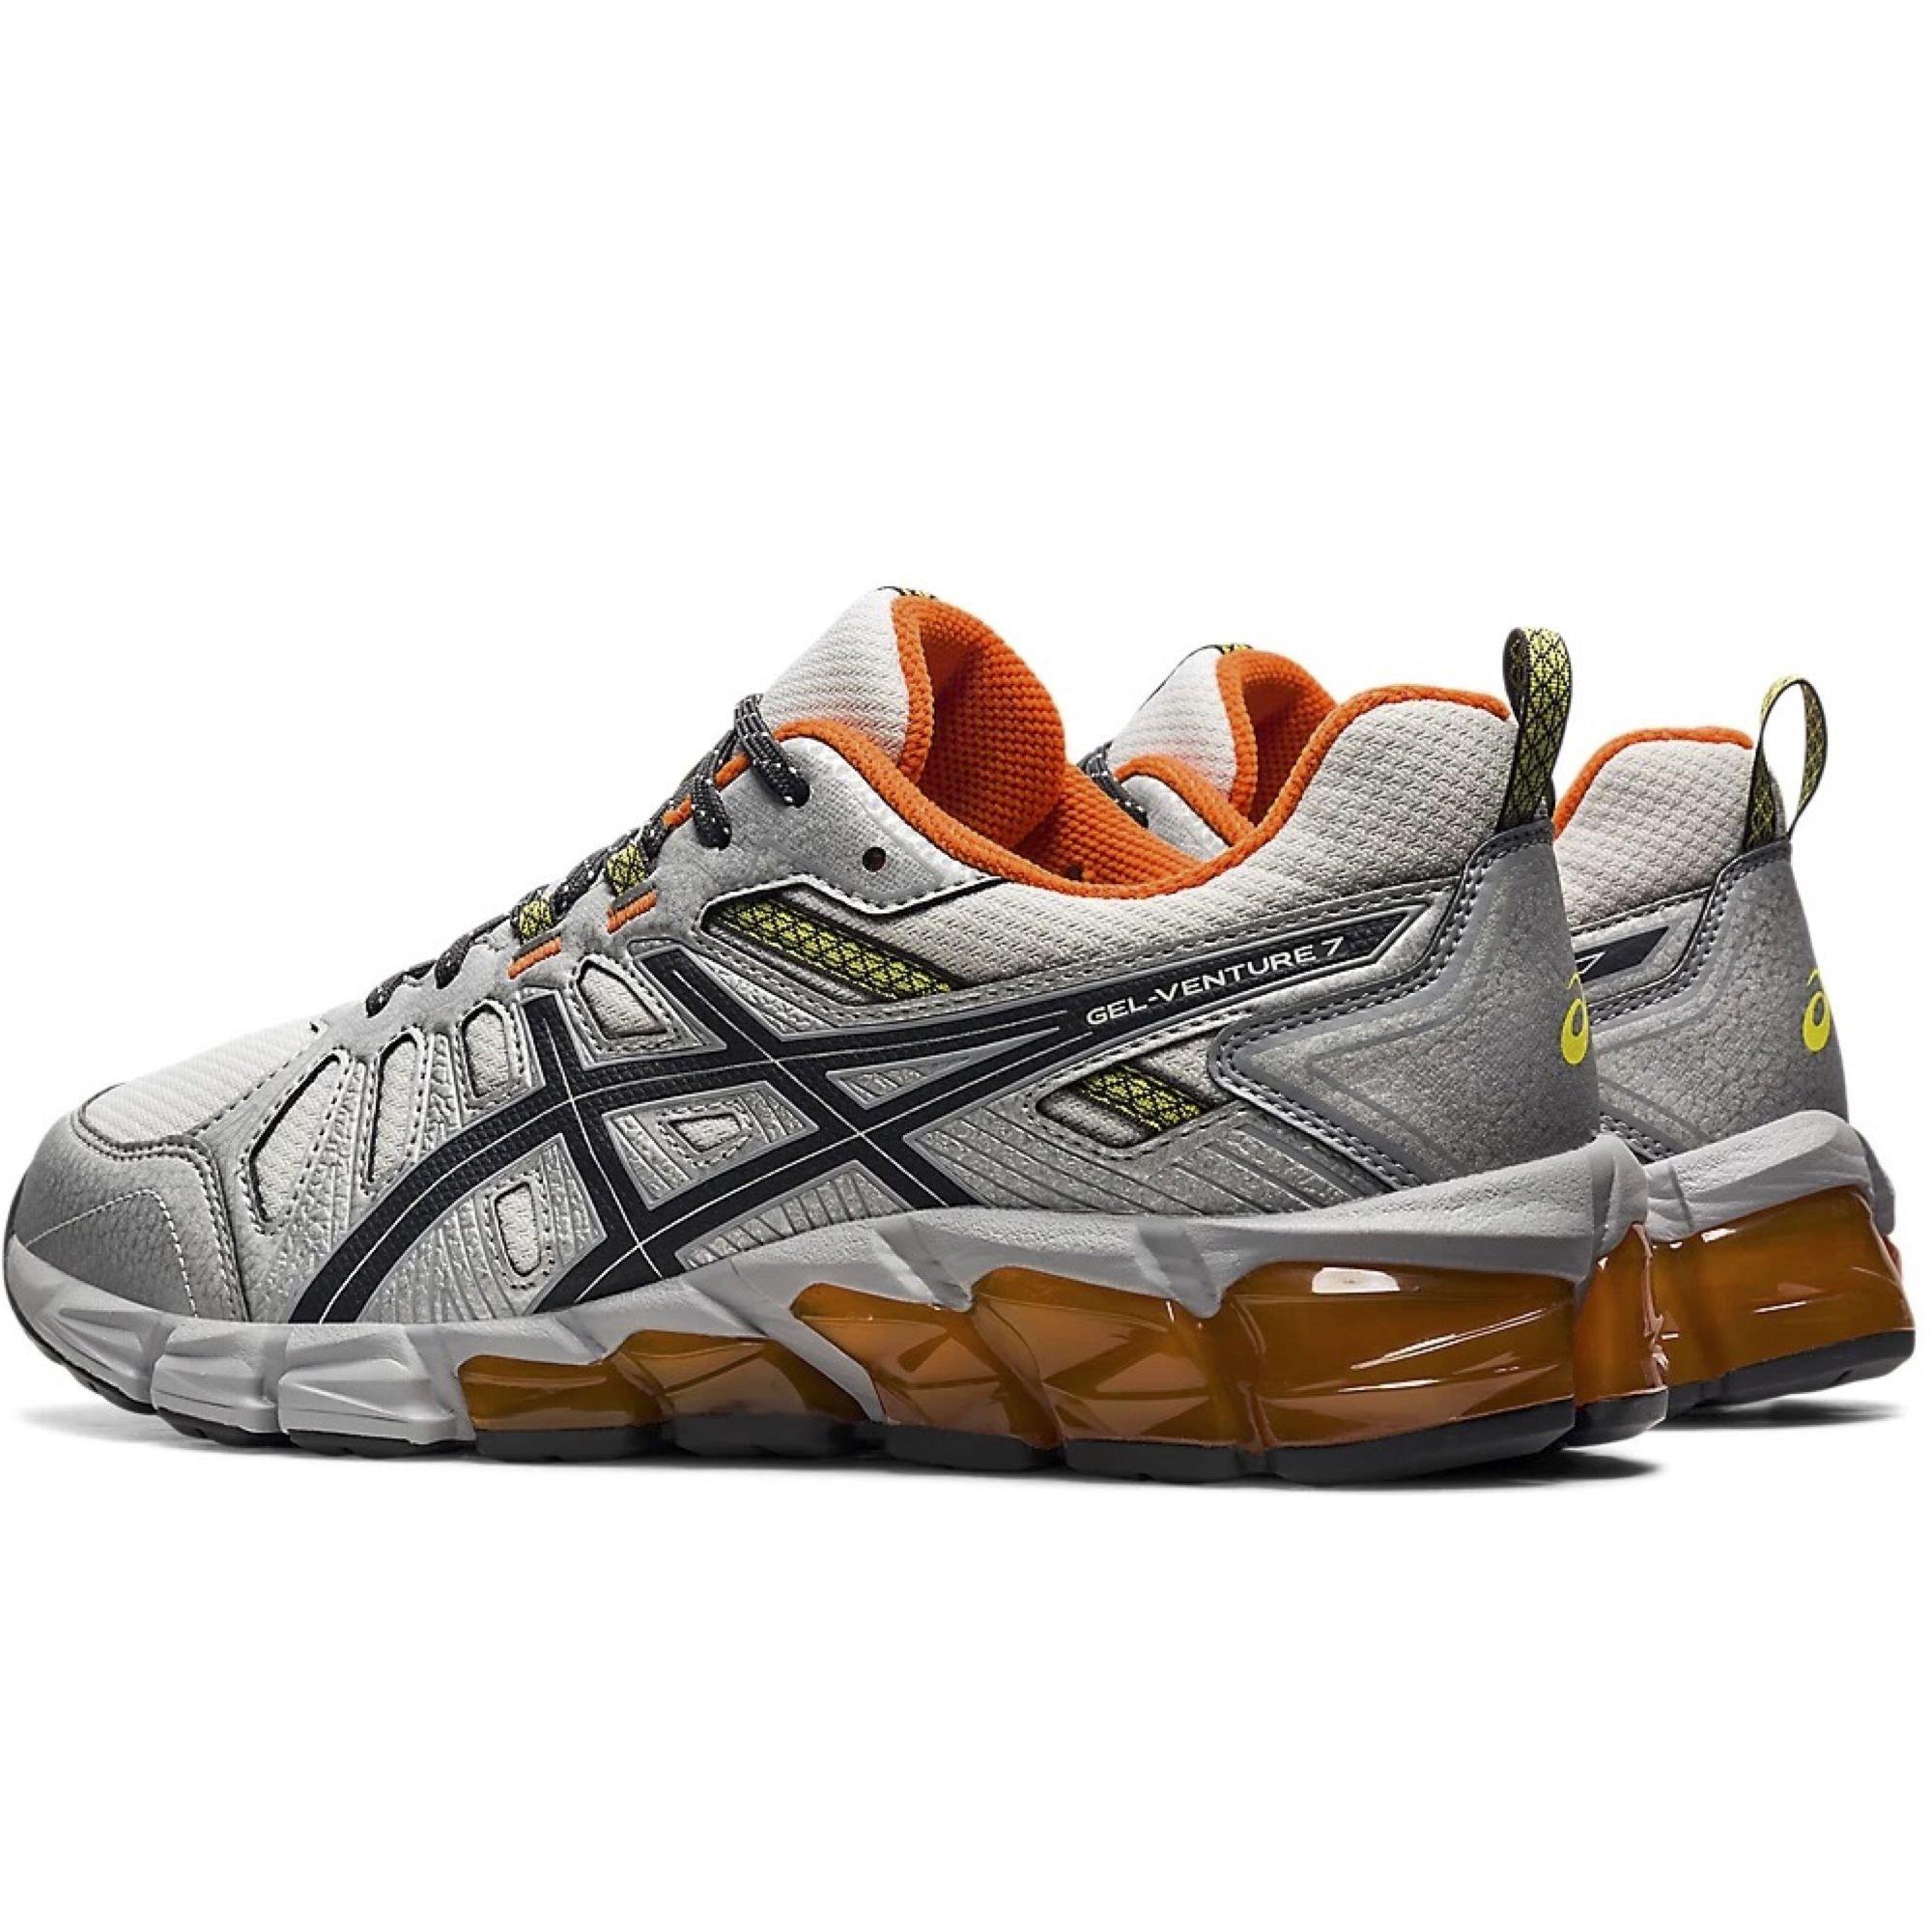 asics GEL-VENTURE™ 180 pure silver graphite grey